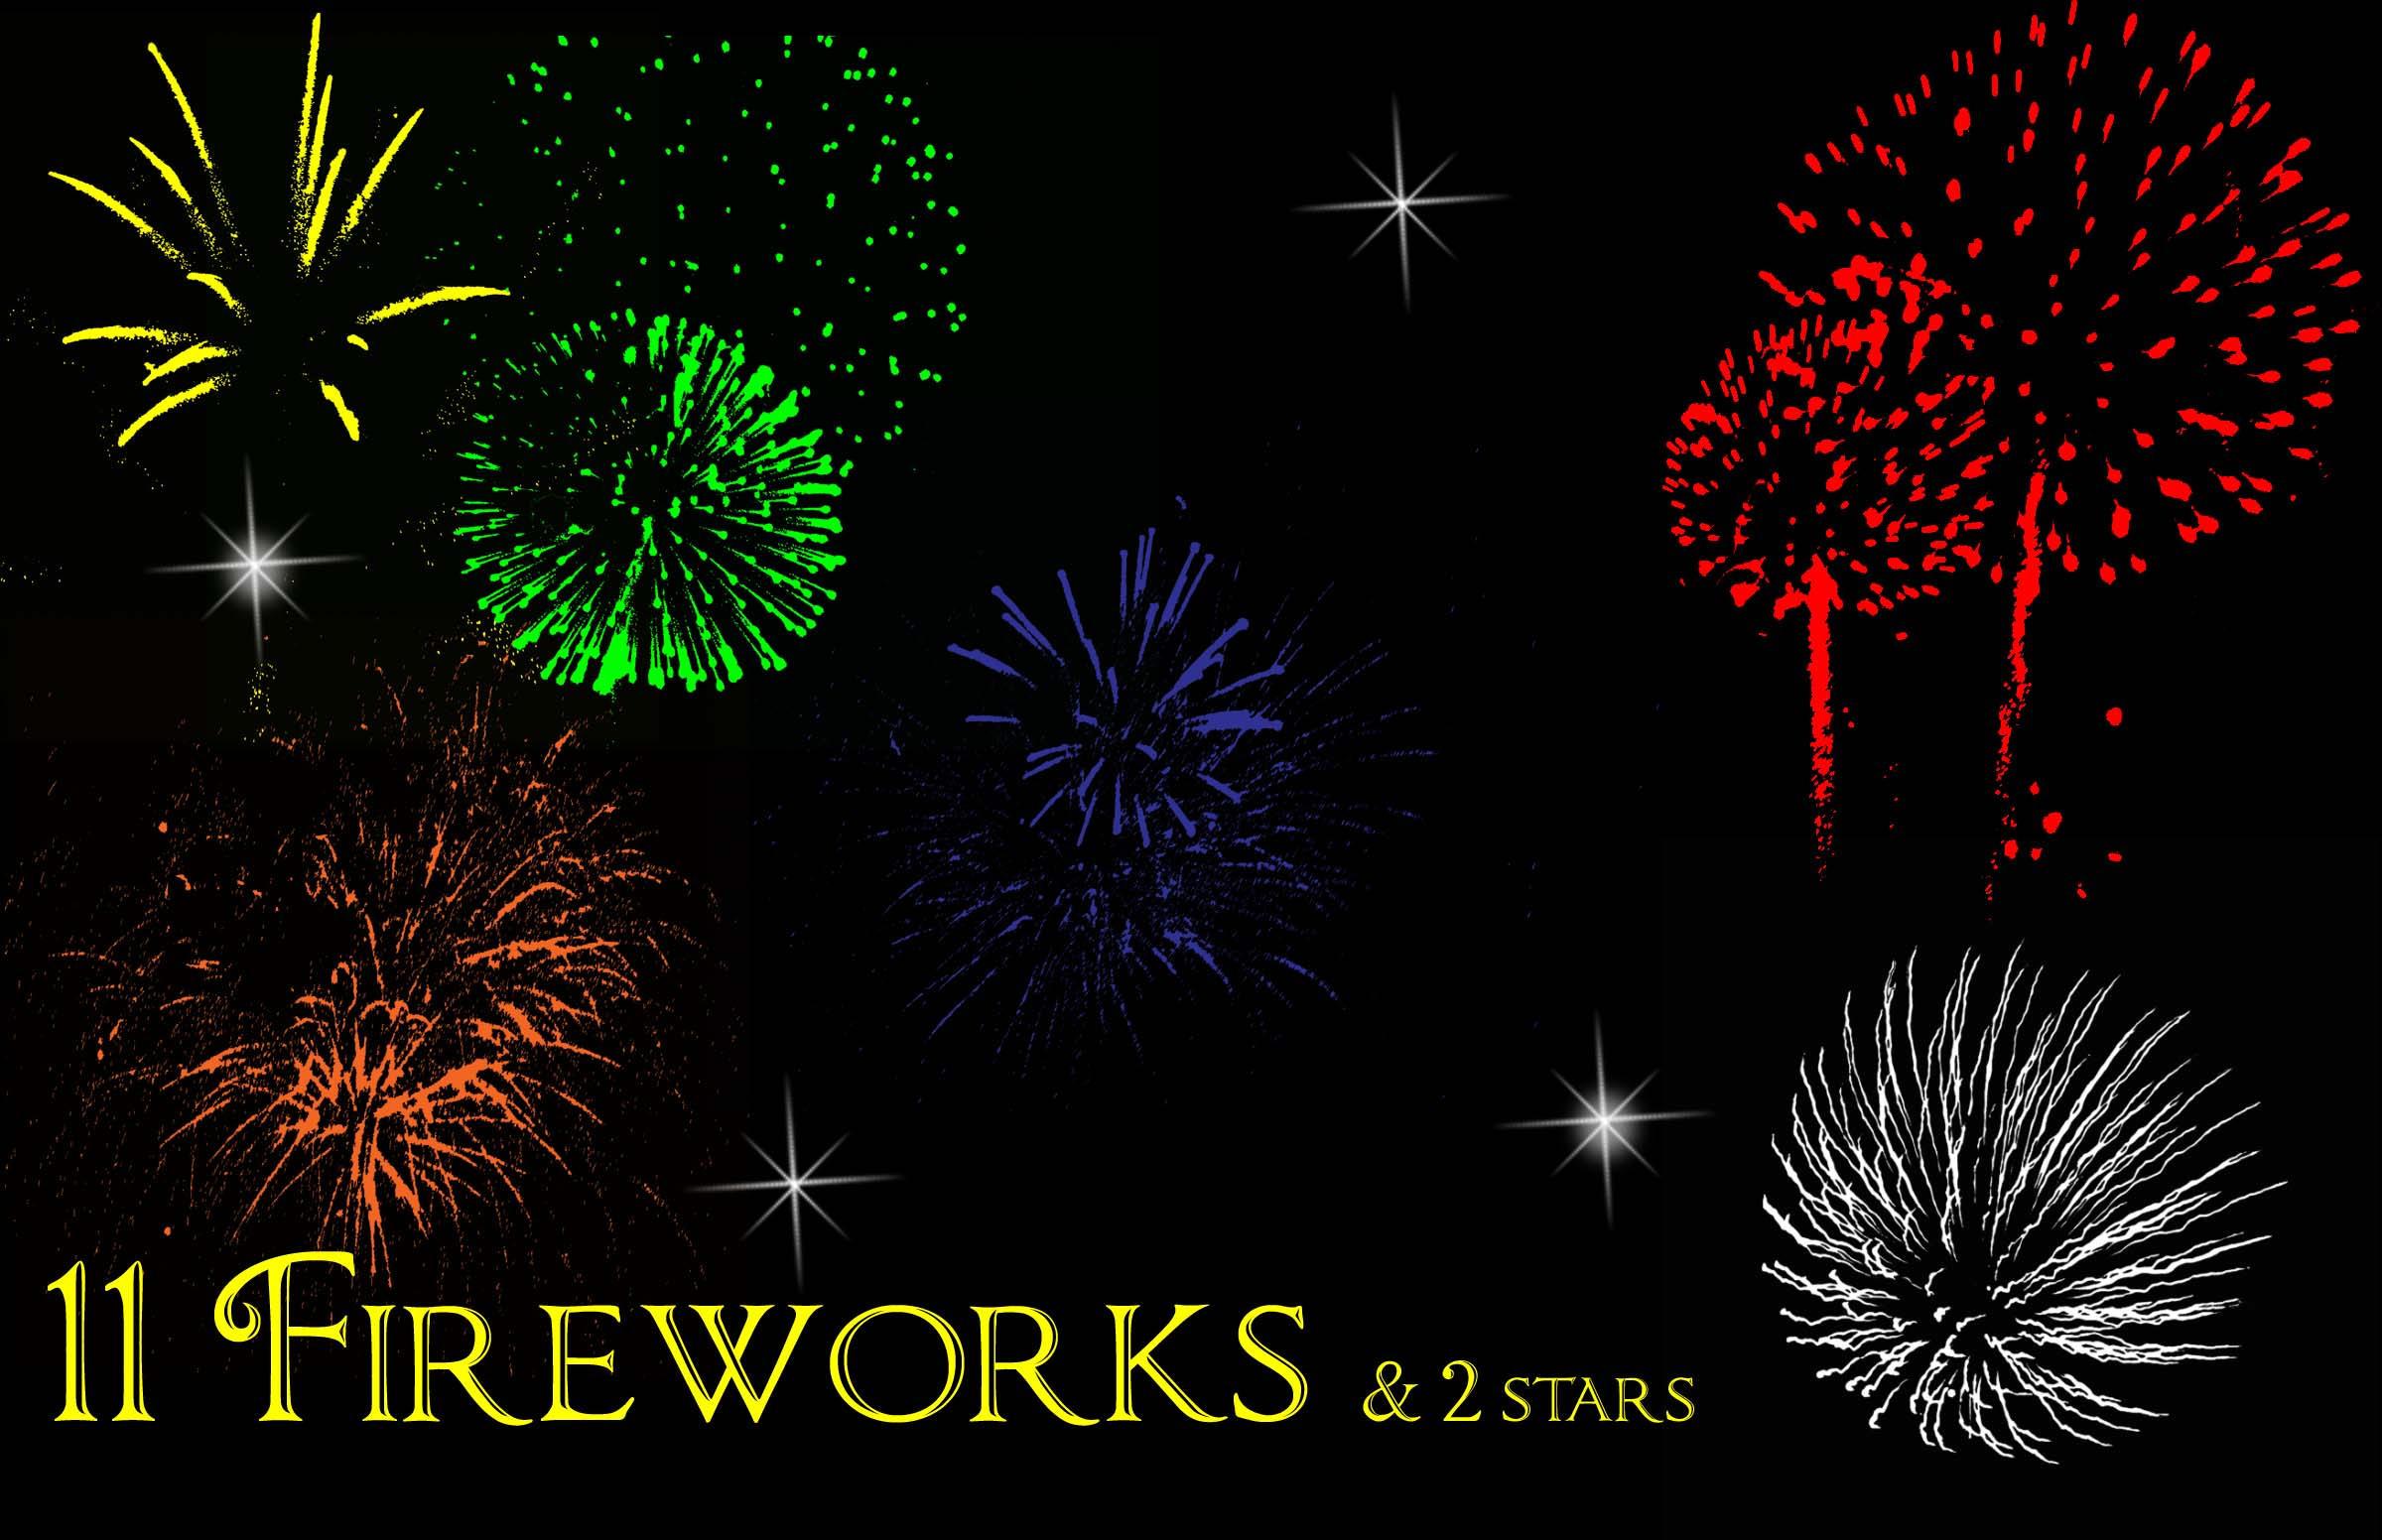 Firework brushes by mandykat